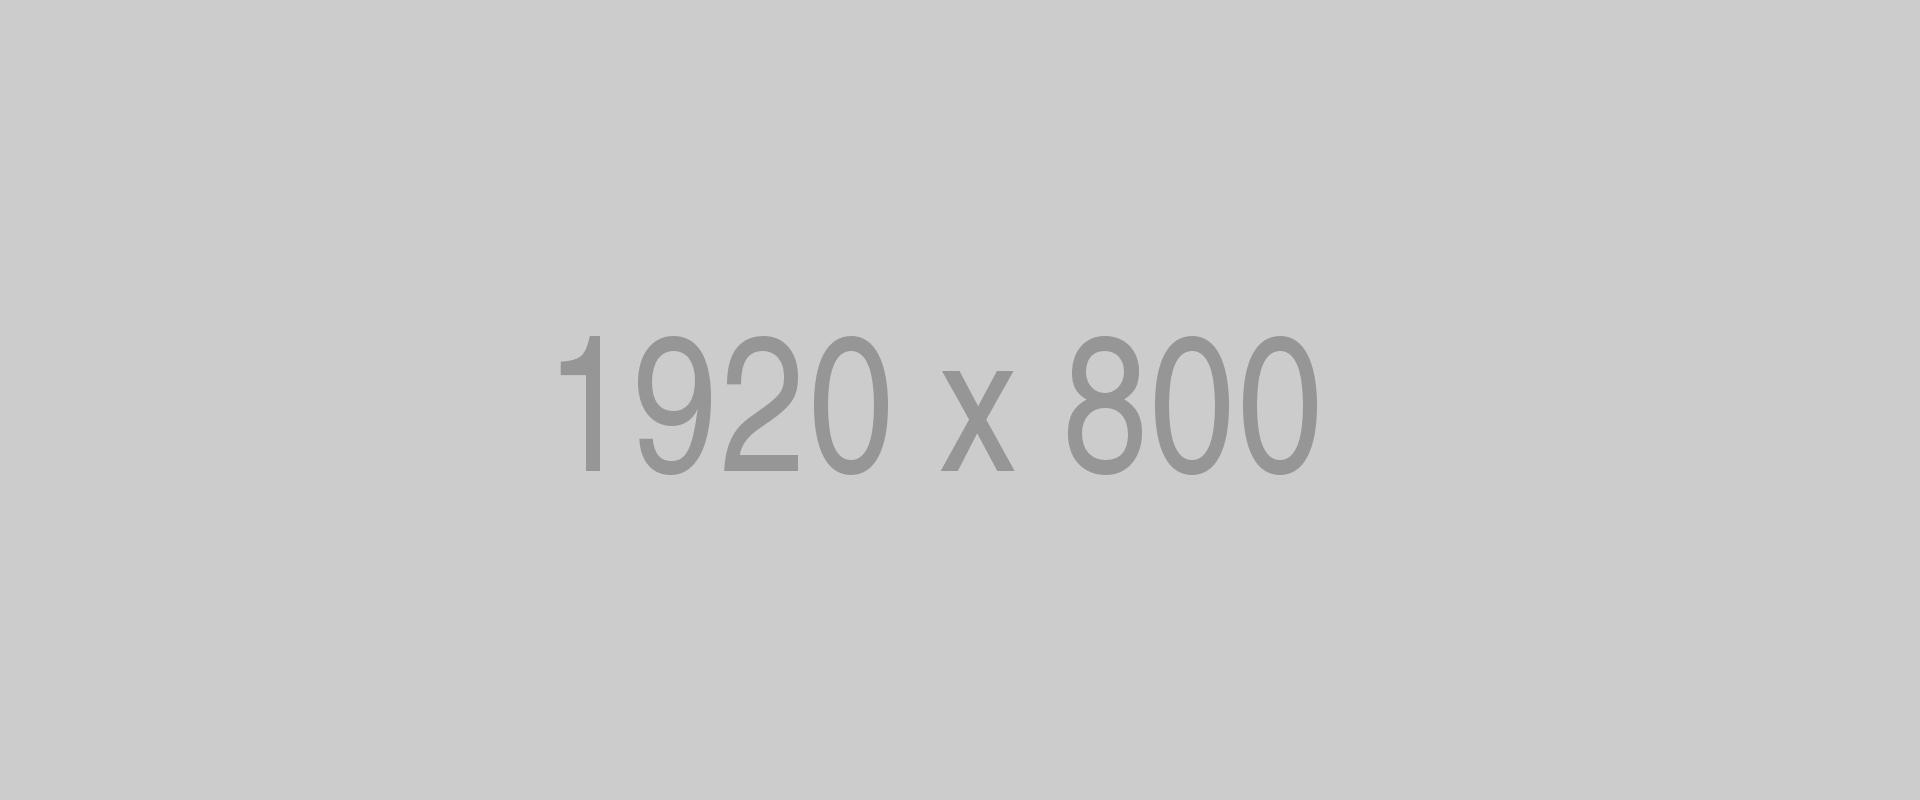 1920x800